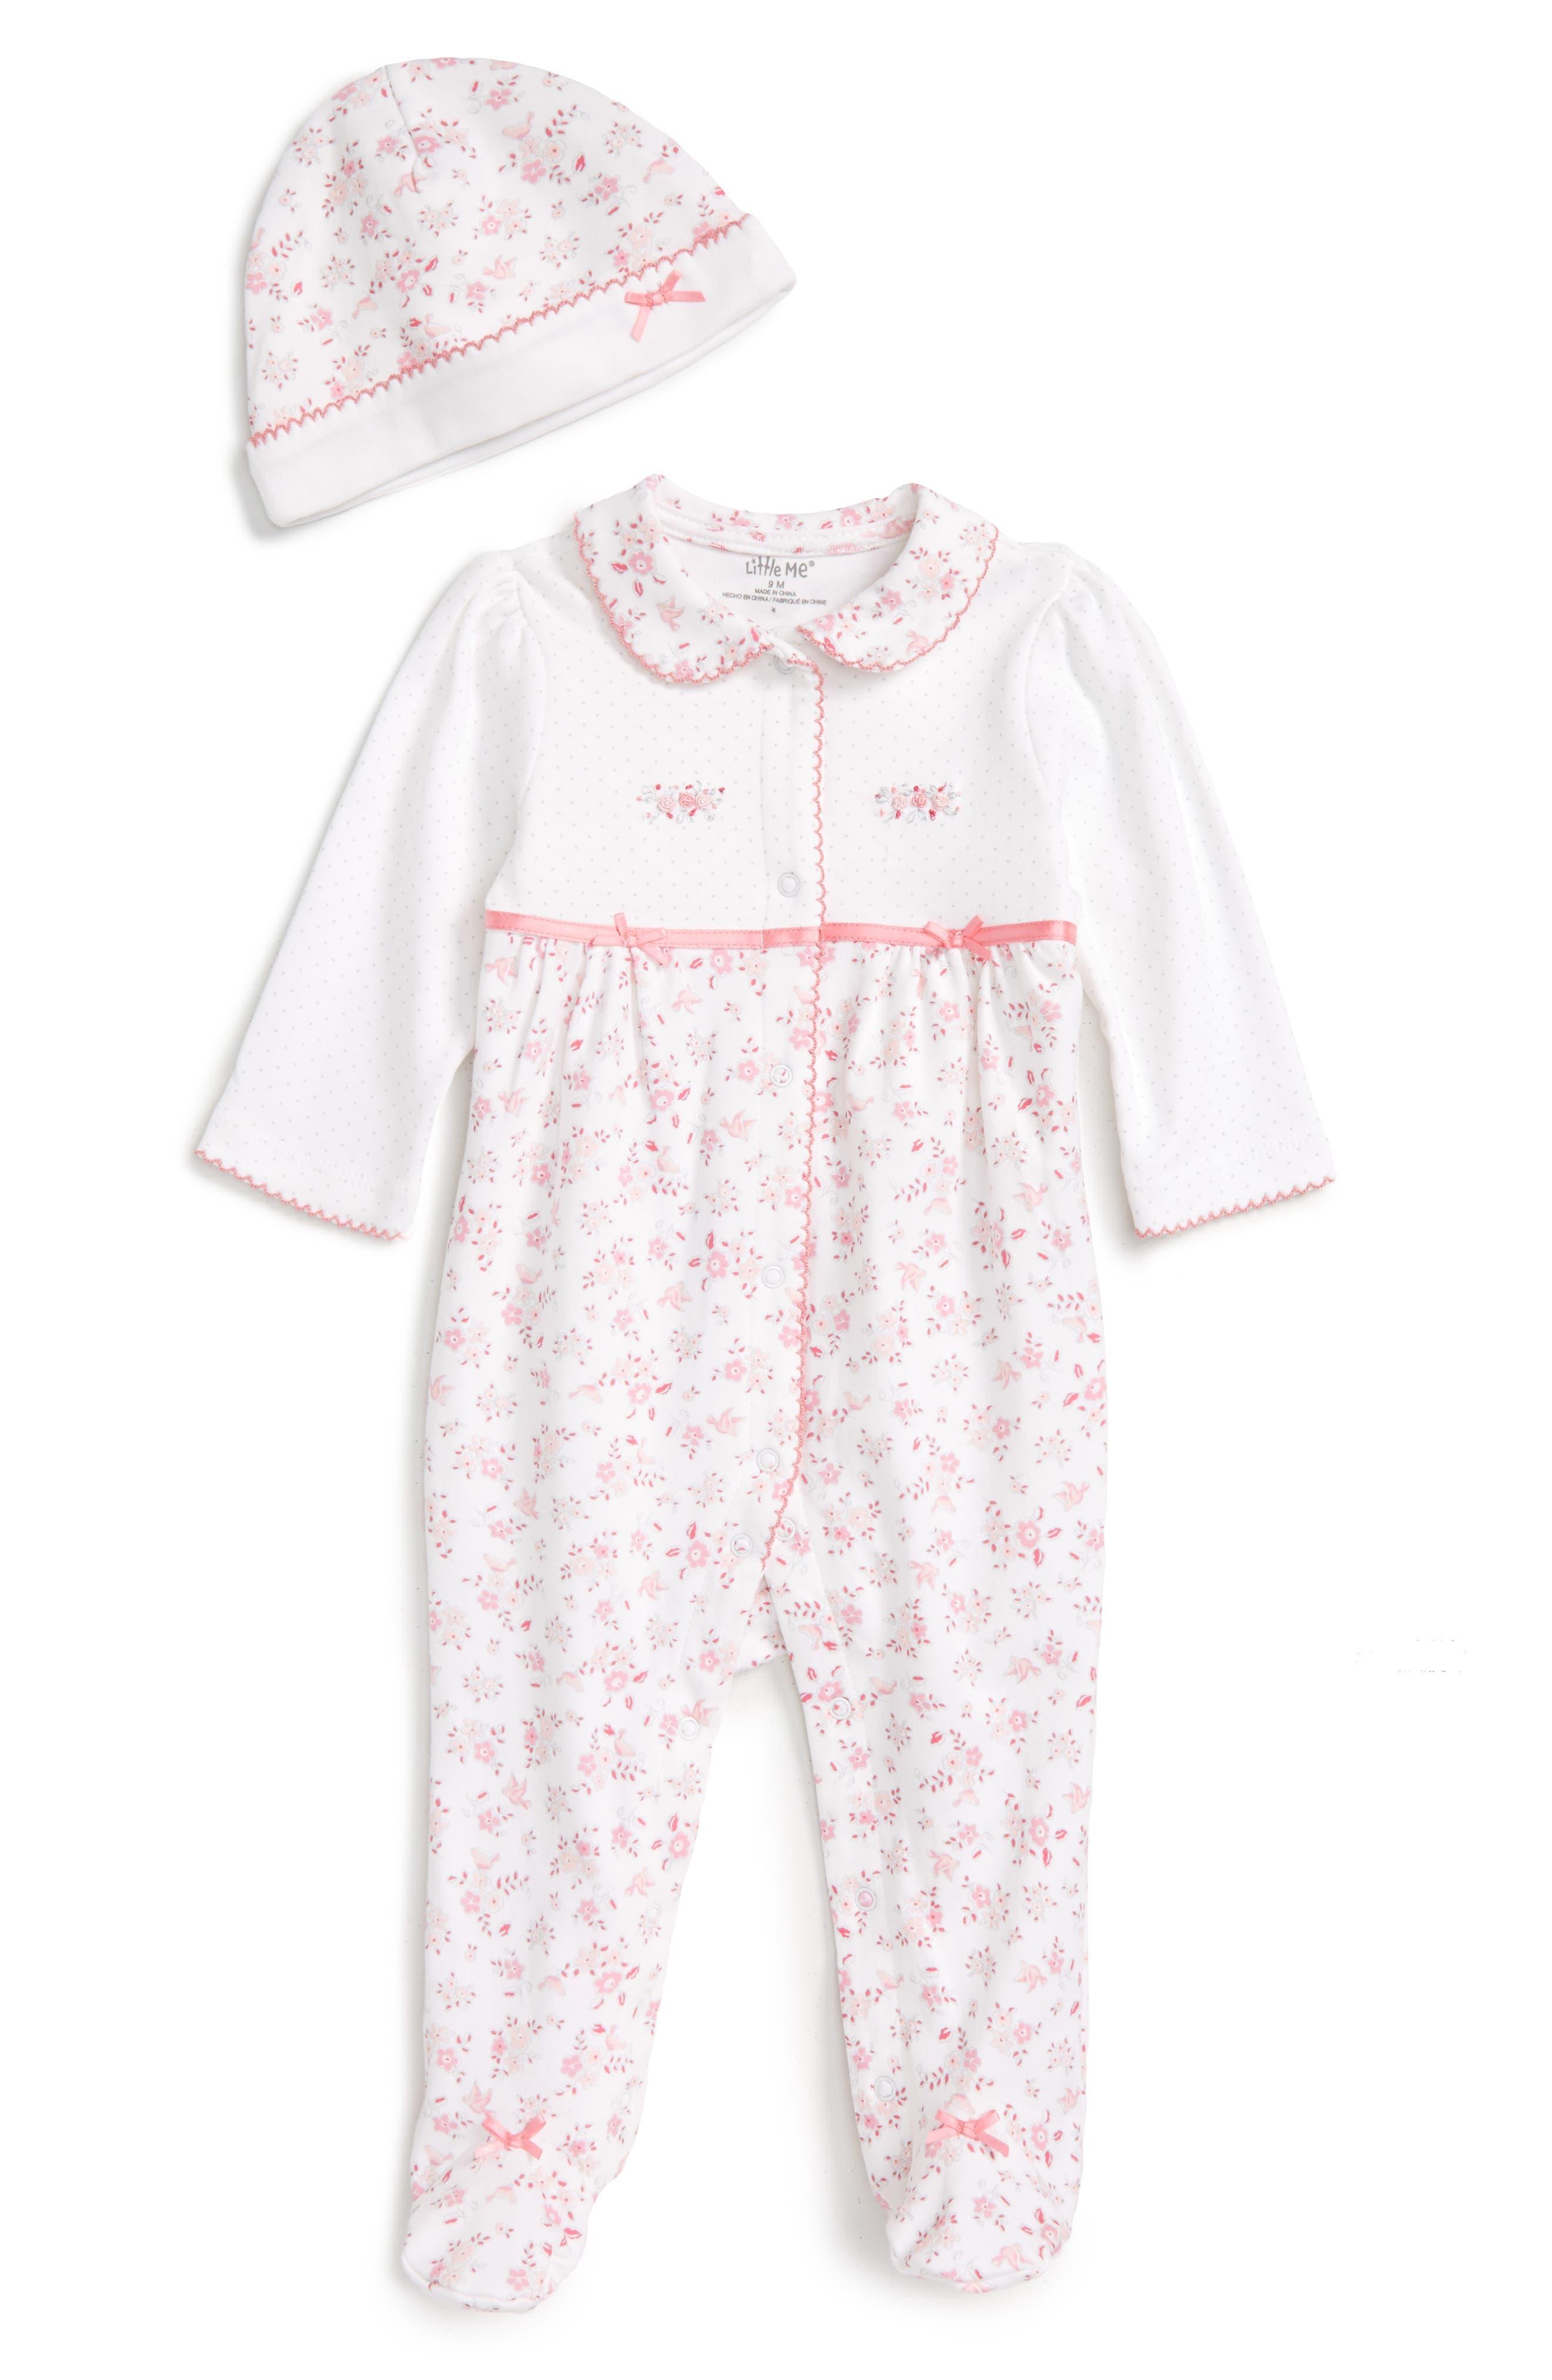 Main Image - Little Me Bird Floral Footie & Hat Set (Baby Girls)